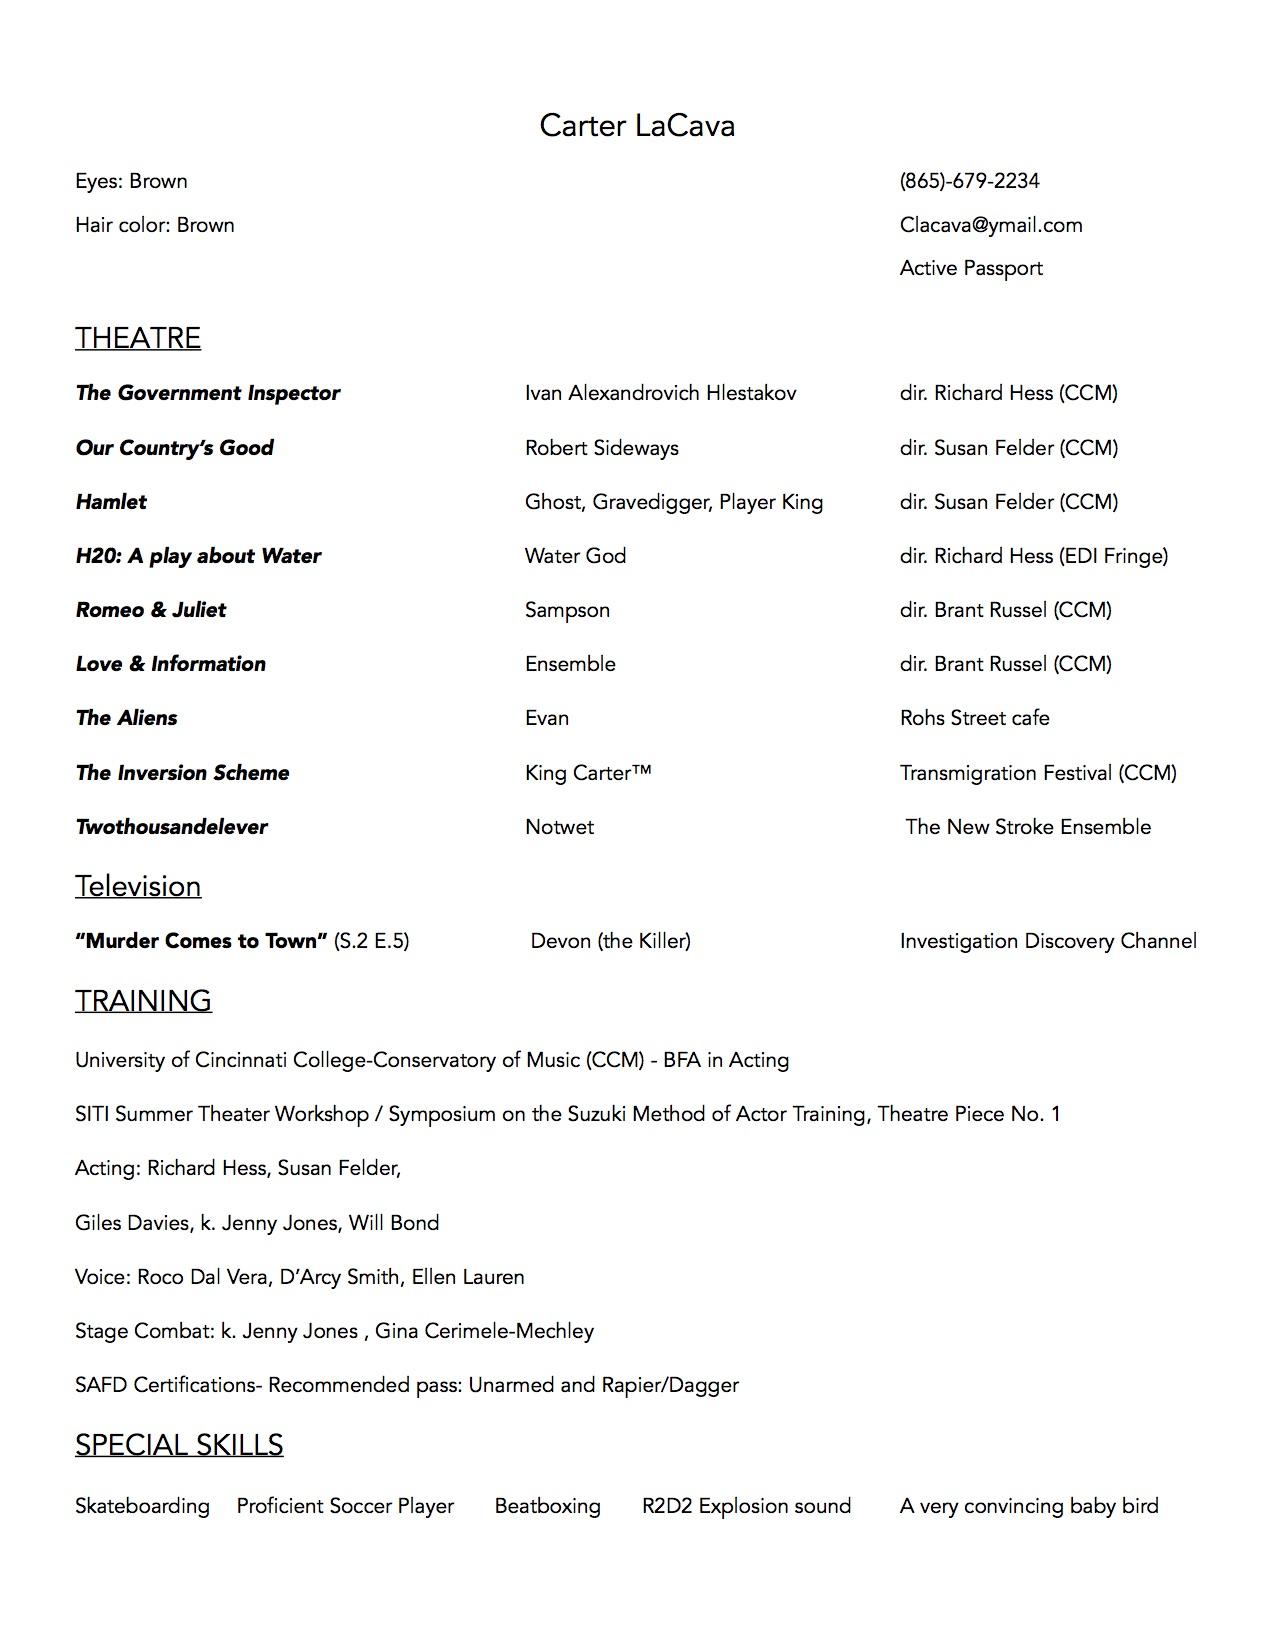 CarterLaCava Resume.jpg